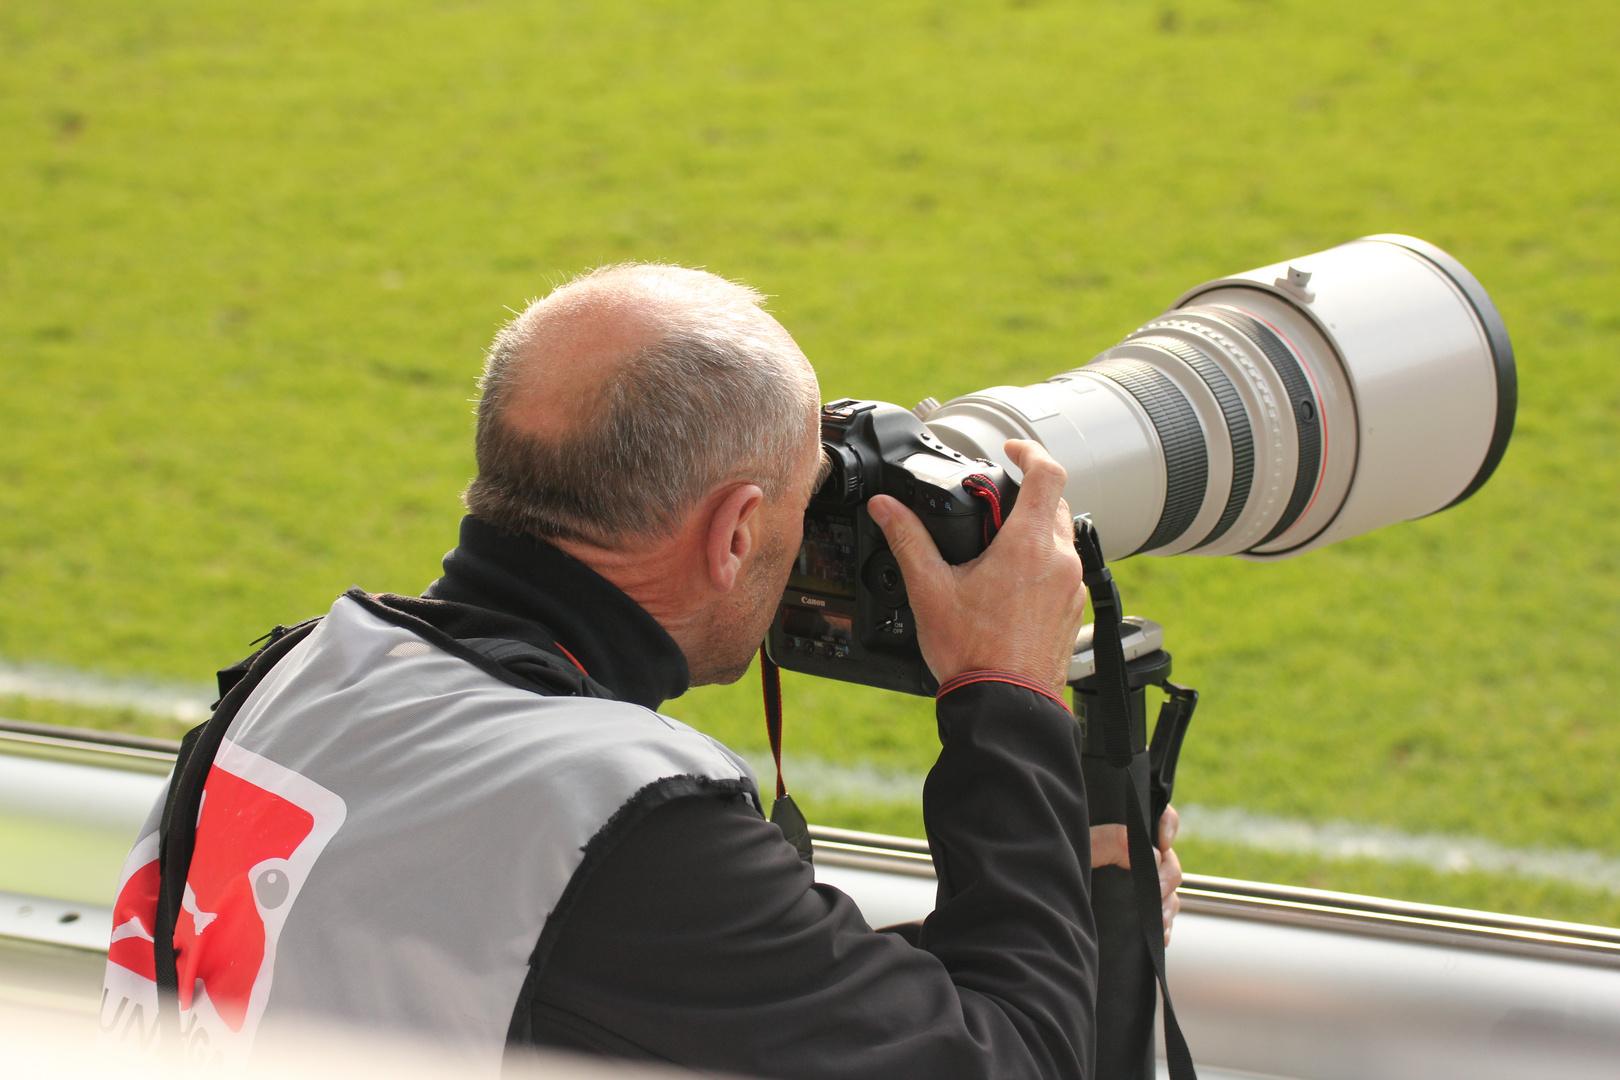 Bundesligafotograf